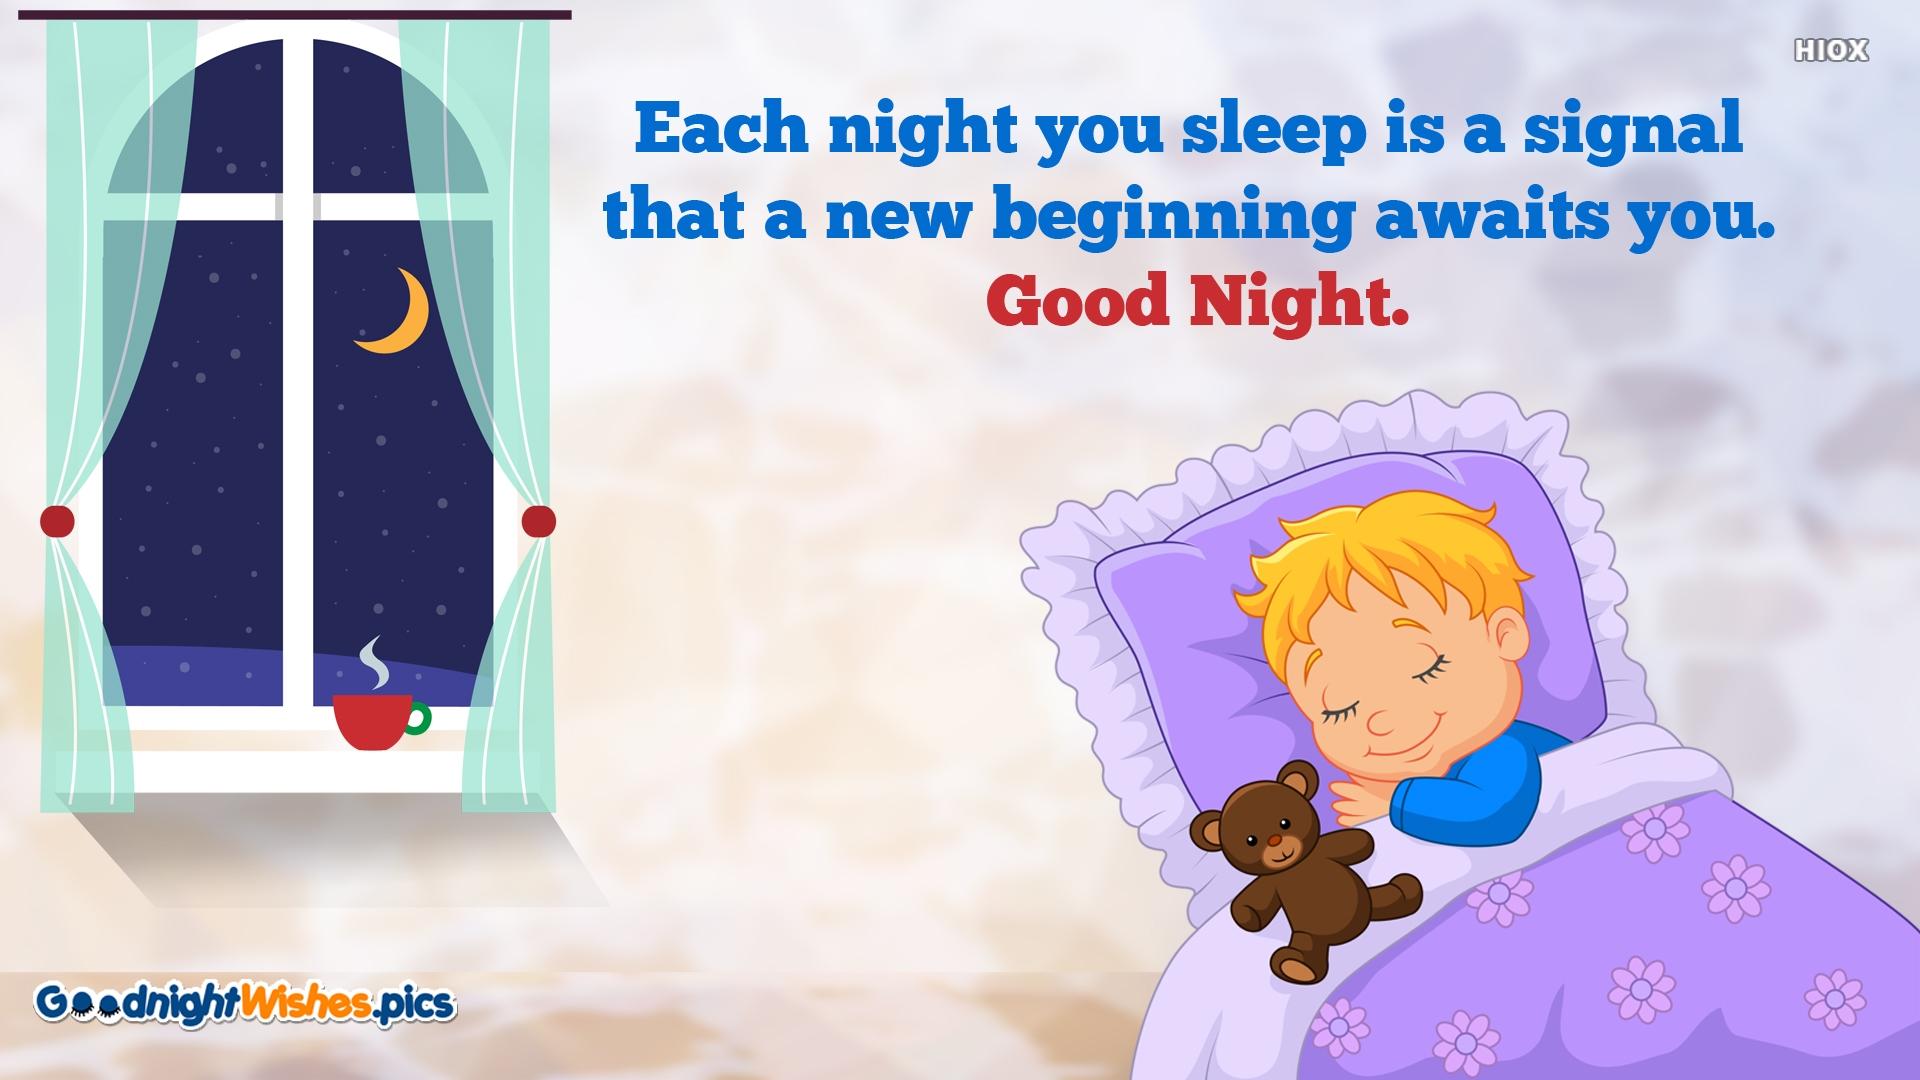 Each Night You Sleep is A Signal That A New Beginning Awaits You. Good Night.